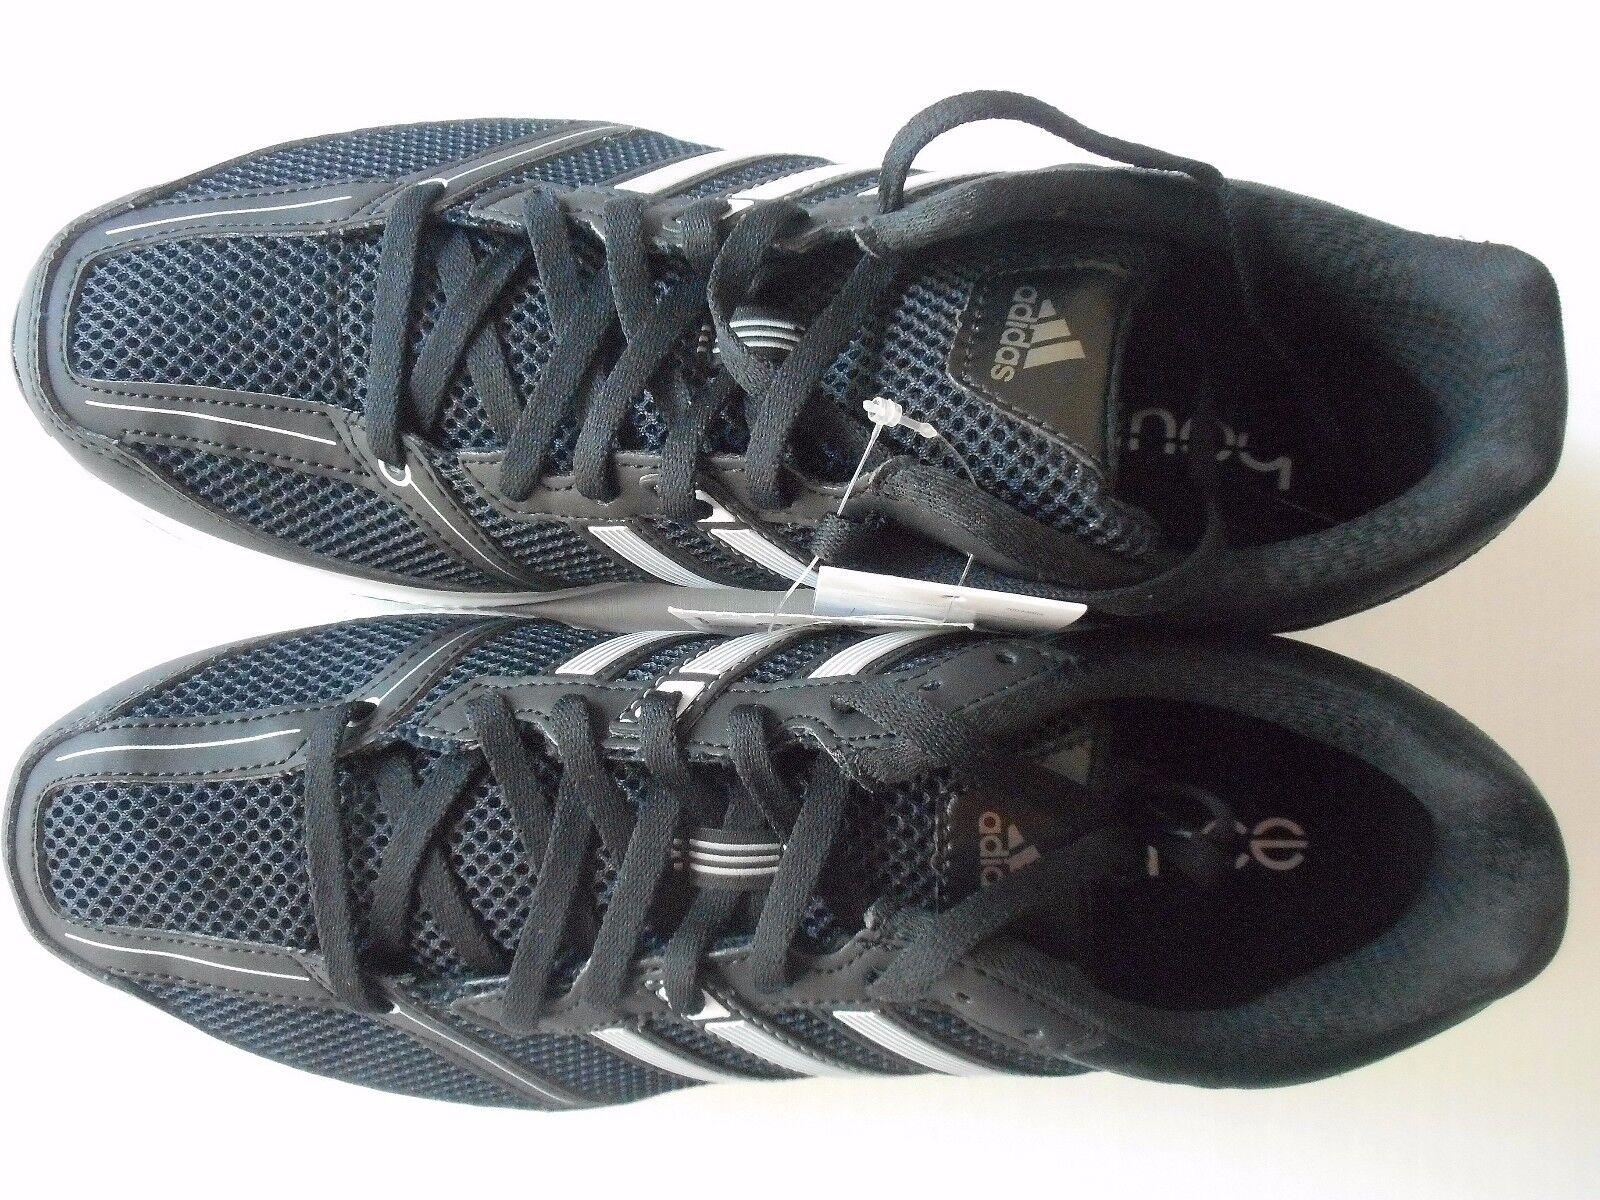 d49972b6b adidas Men s Mana RC Bounce M Running Shoes Black Size UK 8